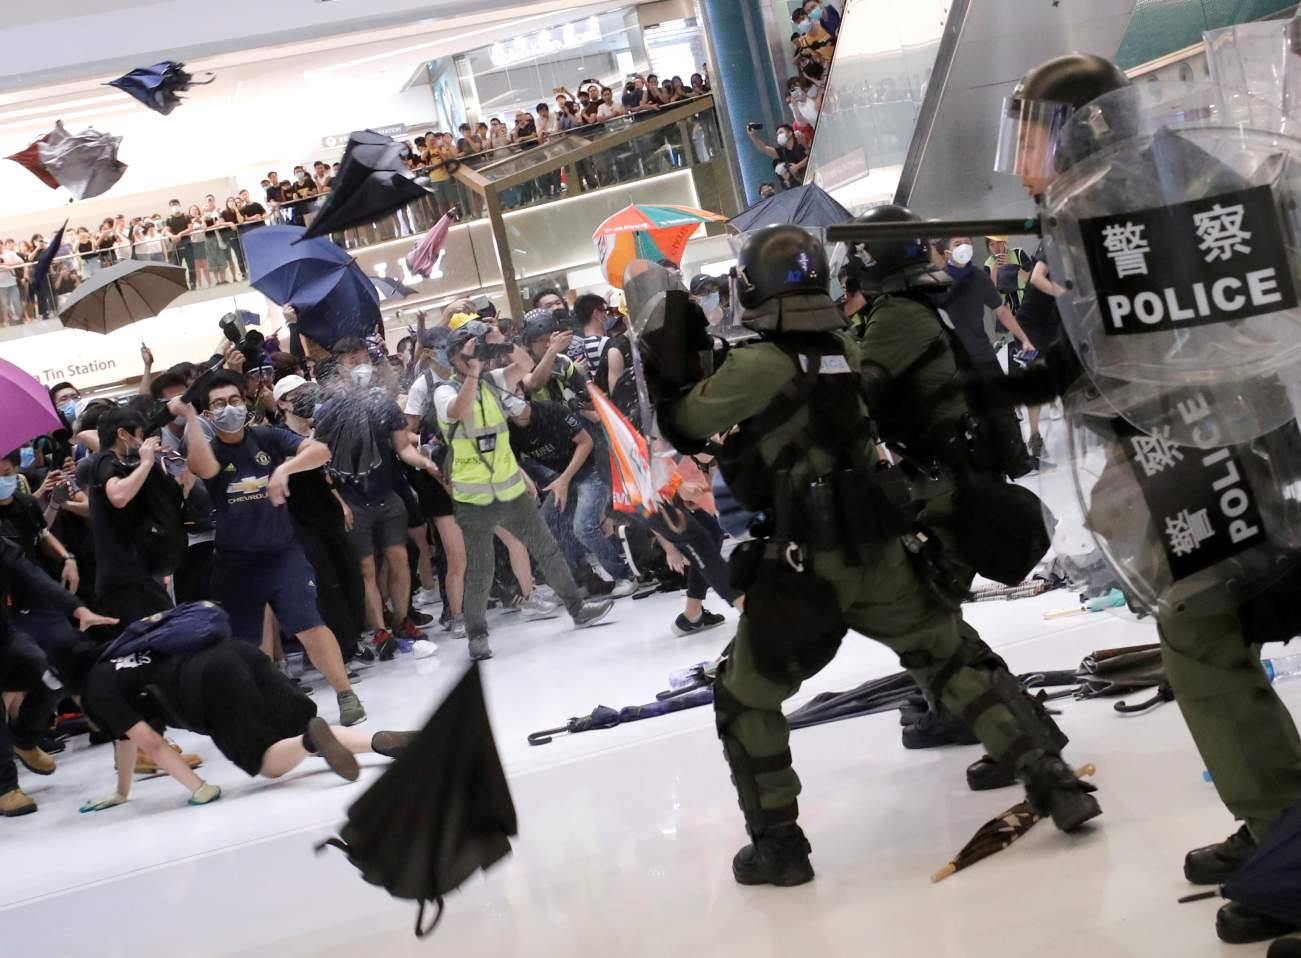 Hong Kong Enters China's Danger Zone Nationellt intresse    Hong Kong går in i Kinas farazon   title=     The National Interest